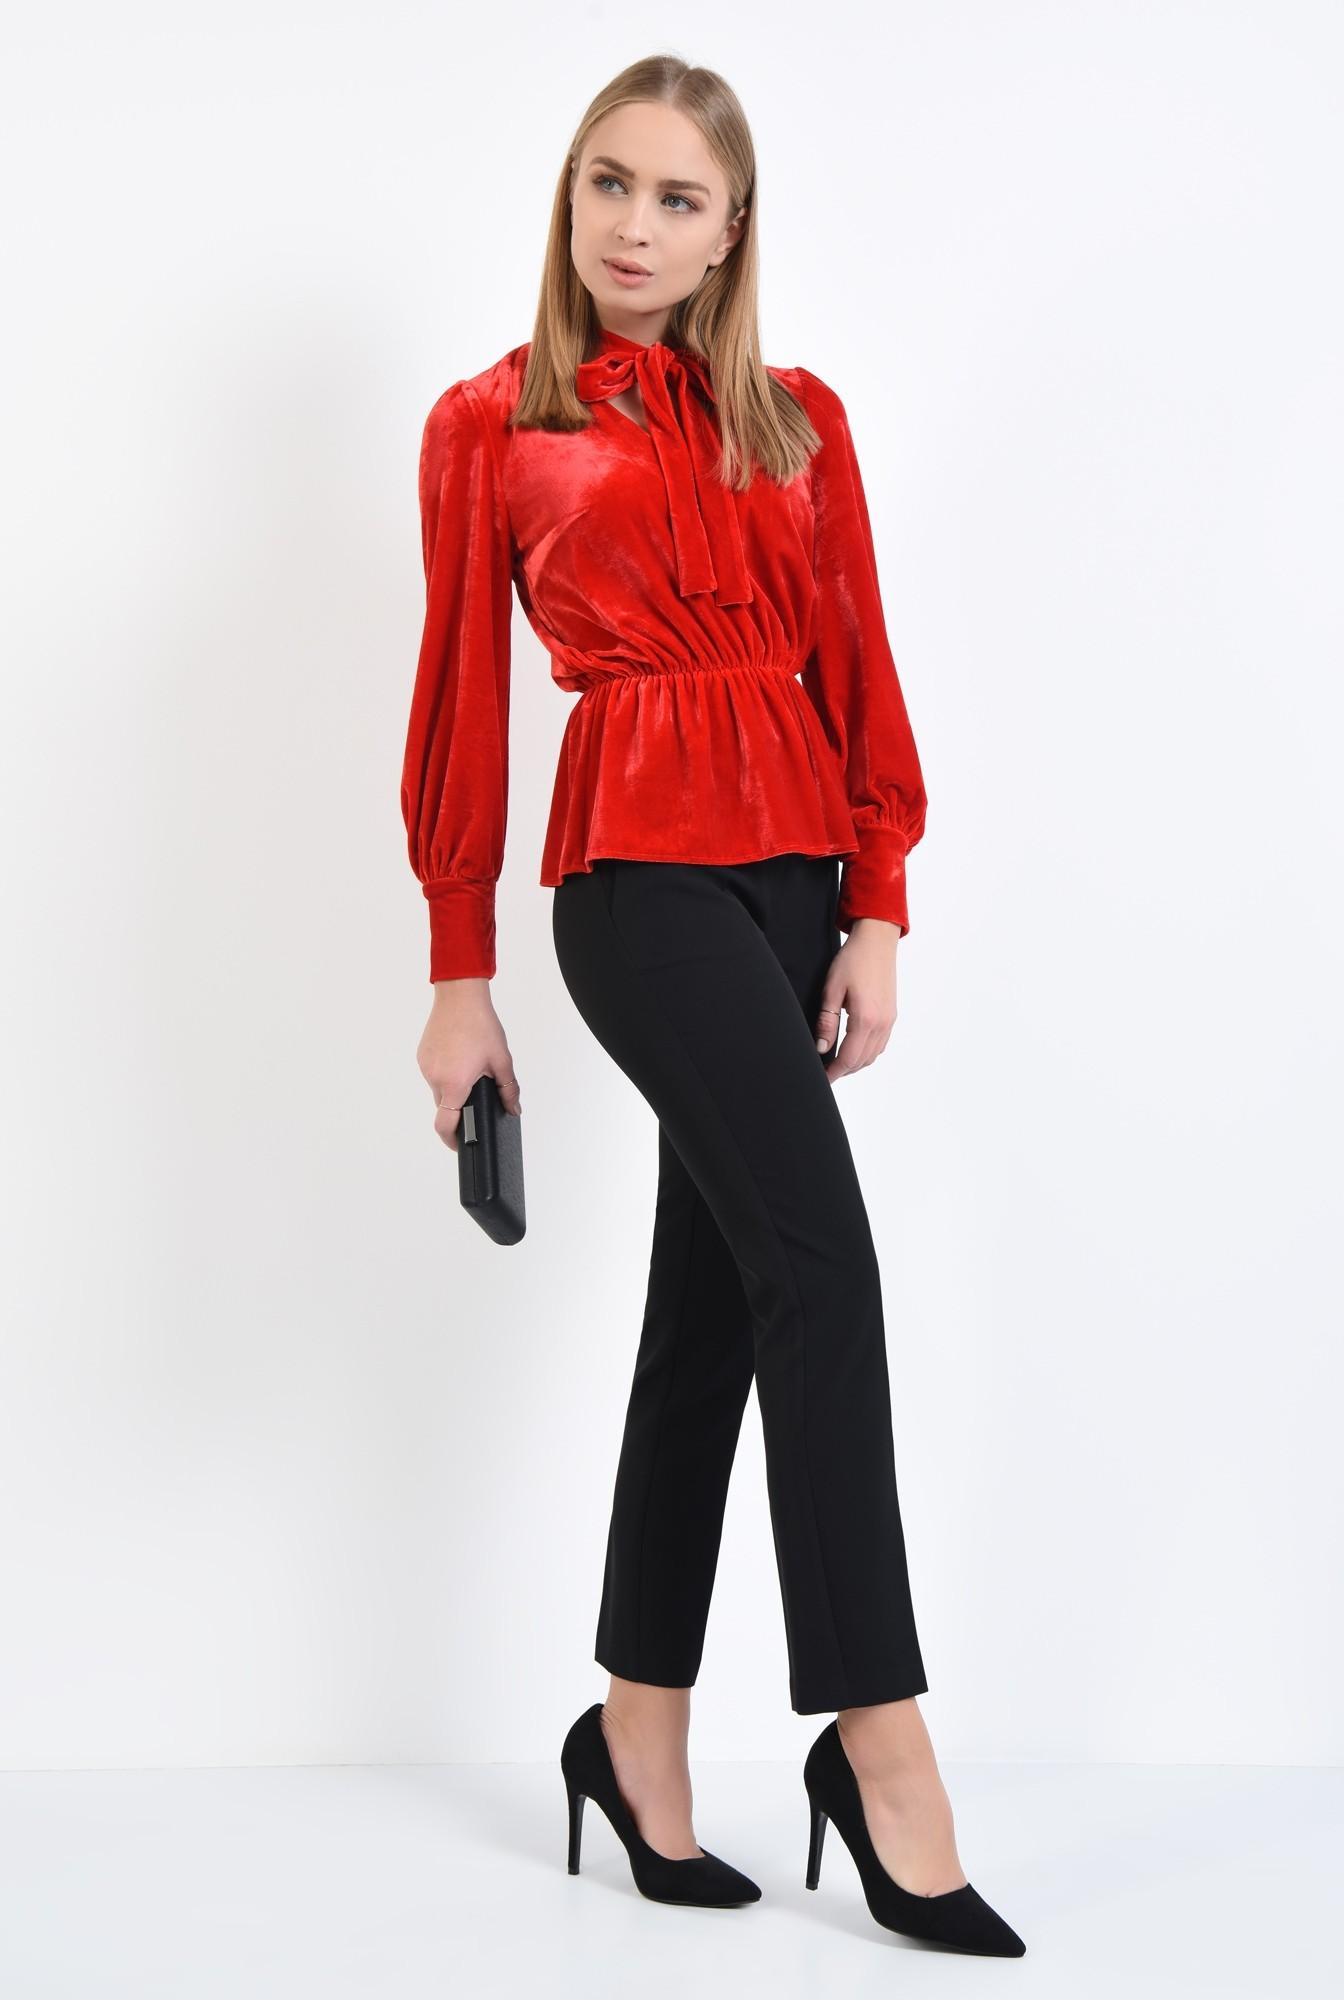 3 - bluza din catifea, rosie, eleganta, bluza dama, online